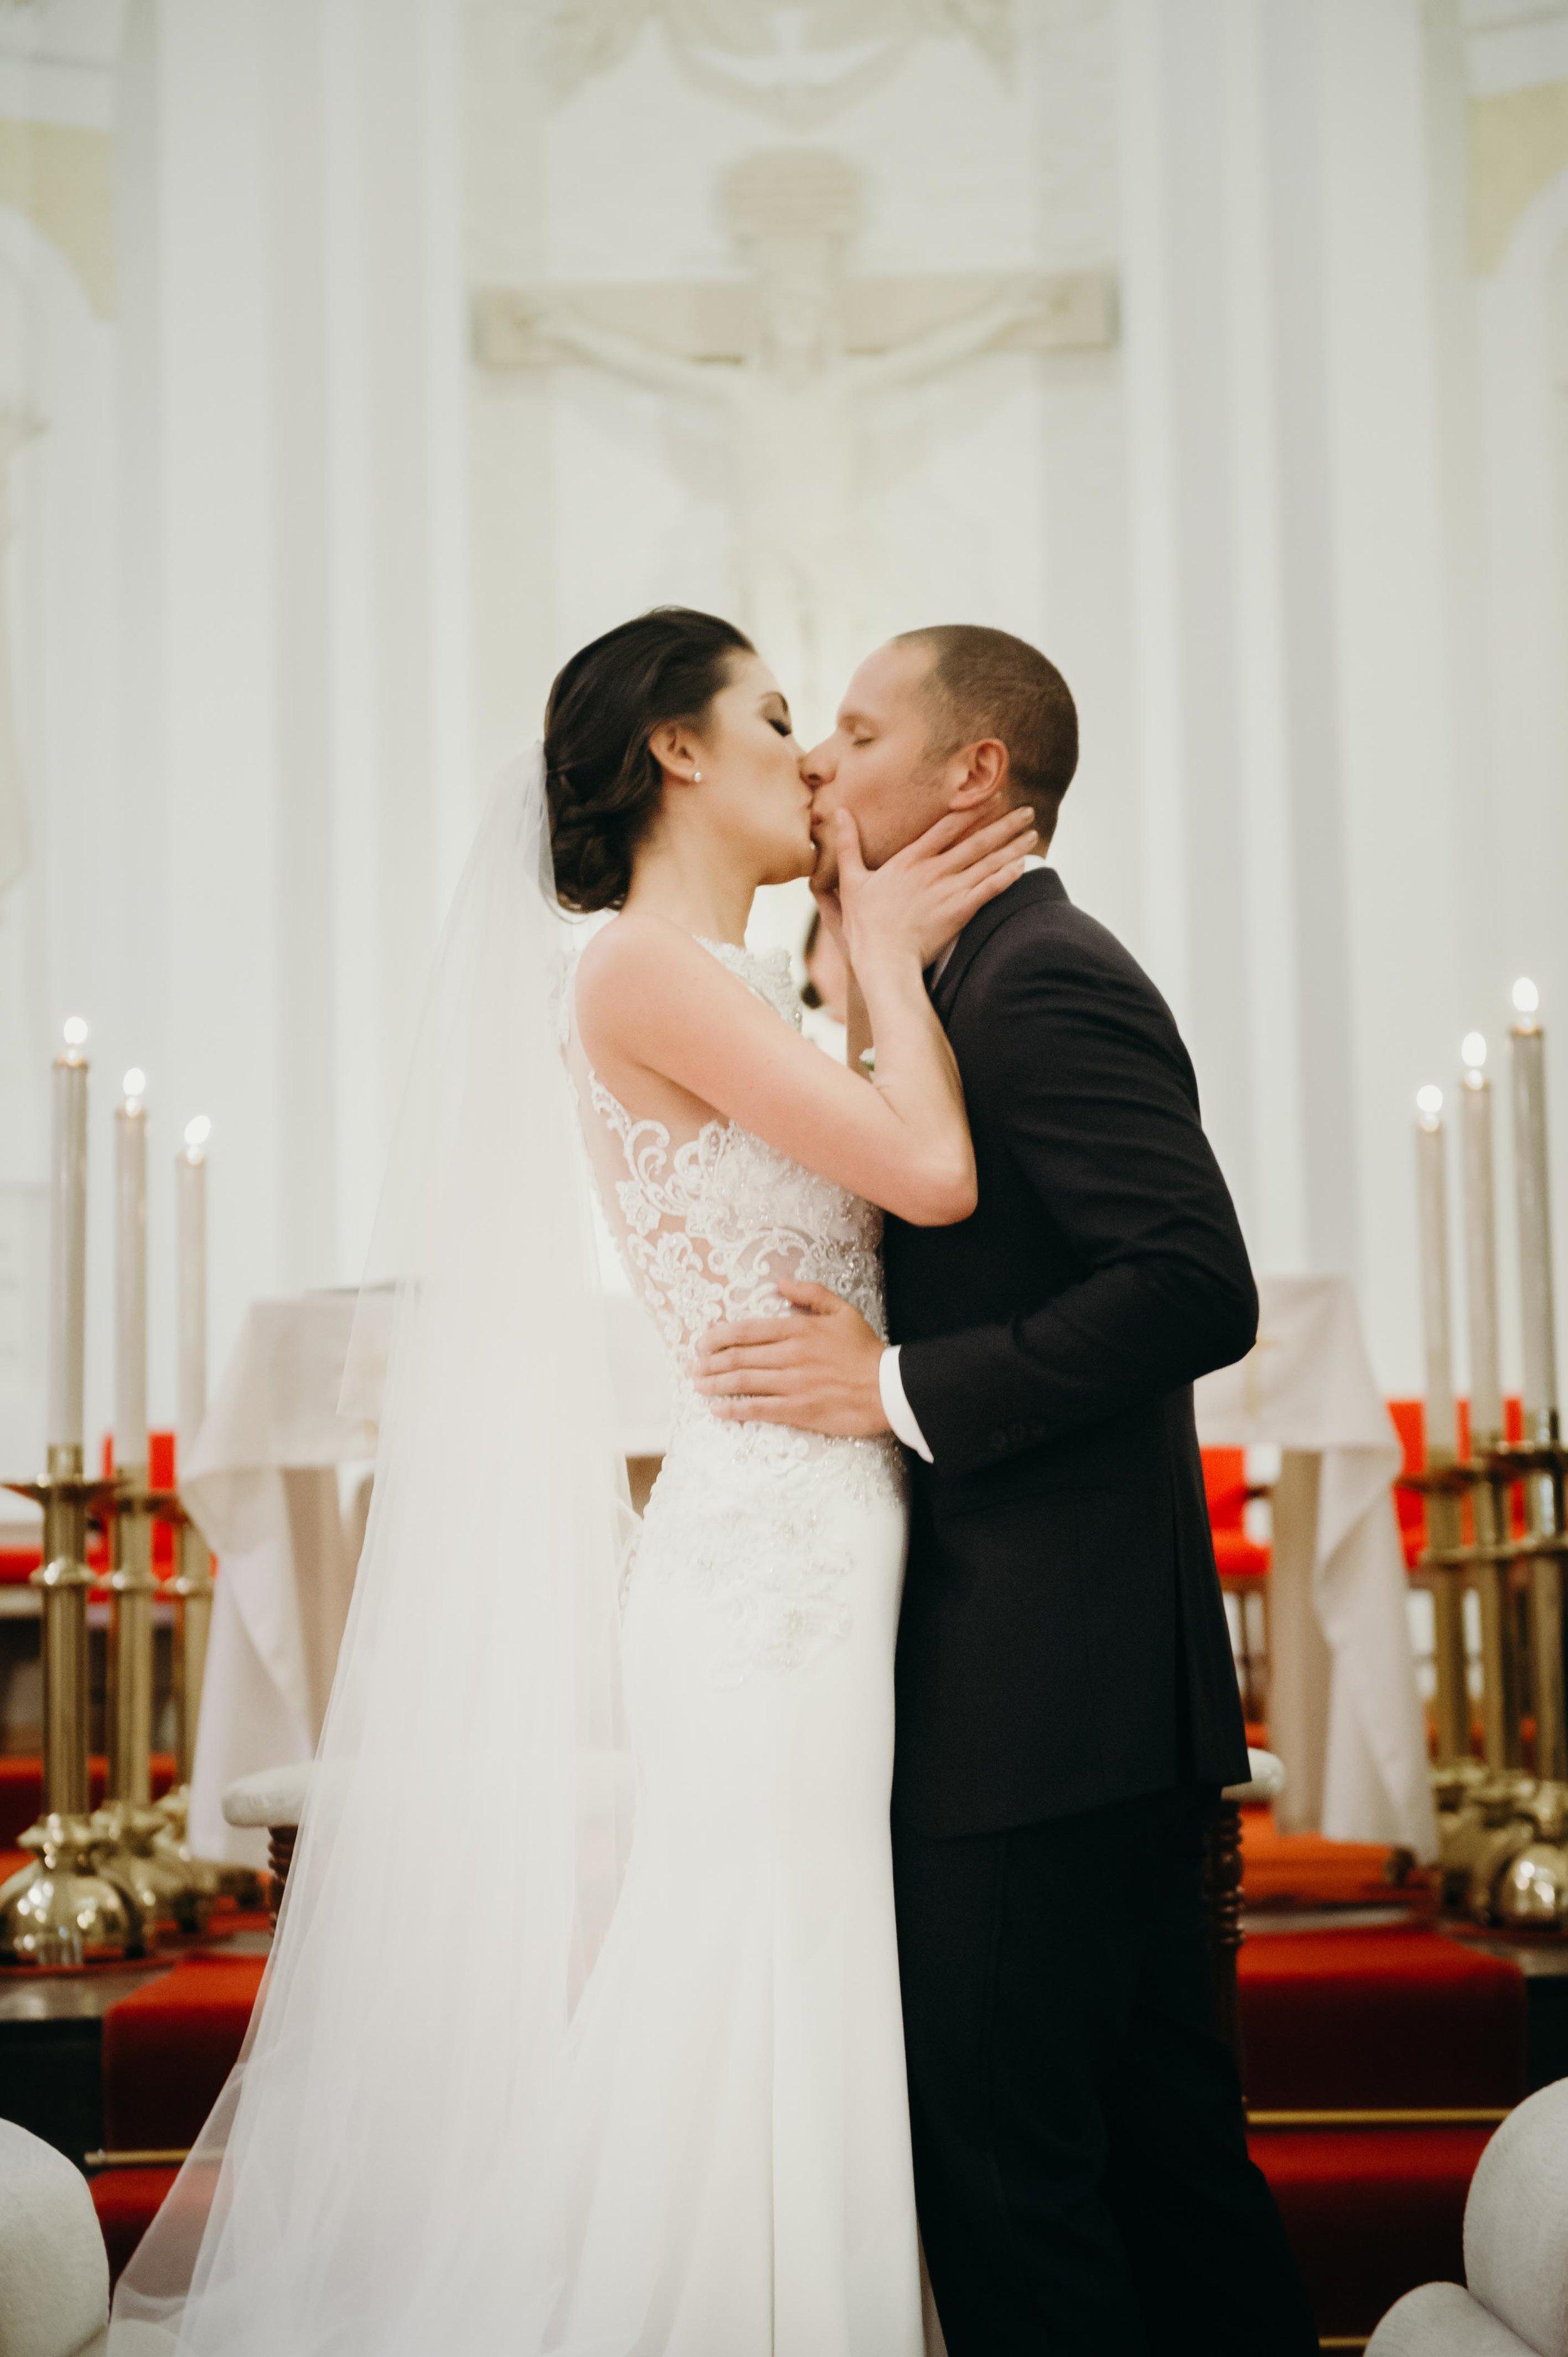 fotografia matrimonio  bogota14.jpg